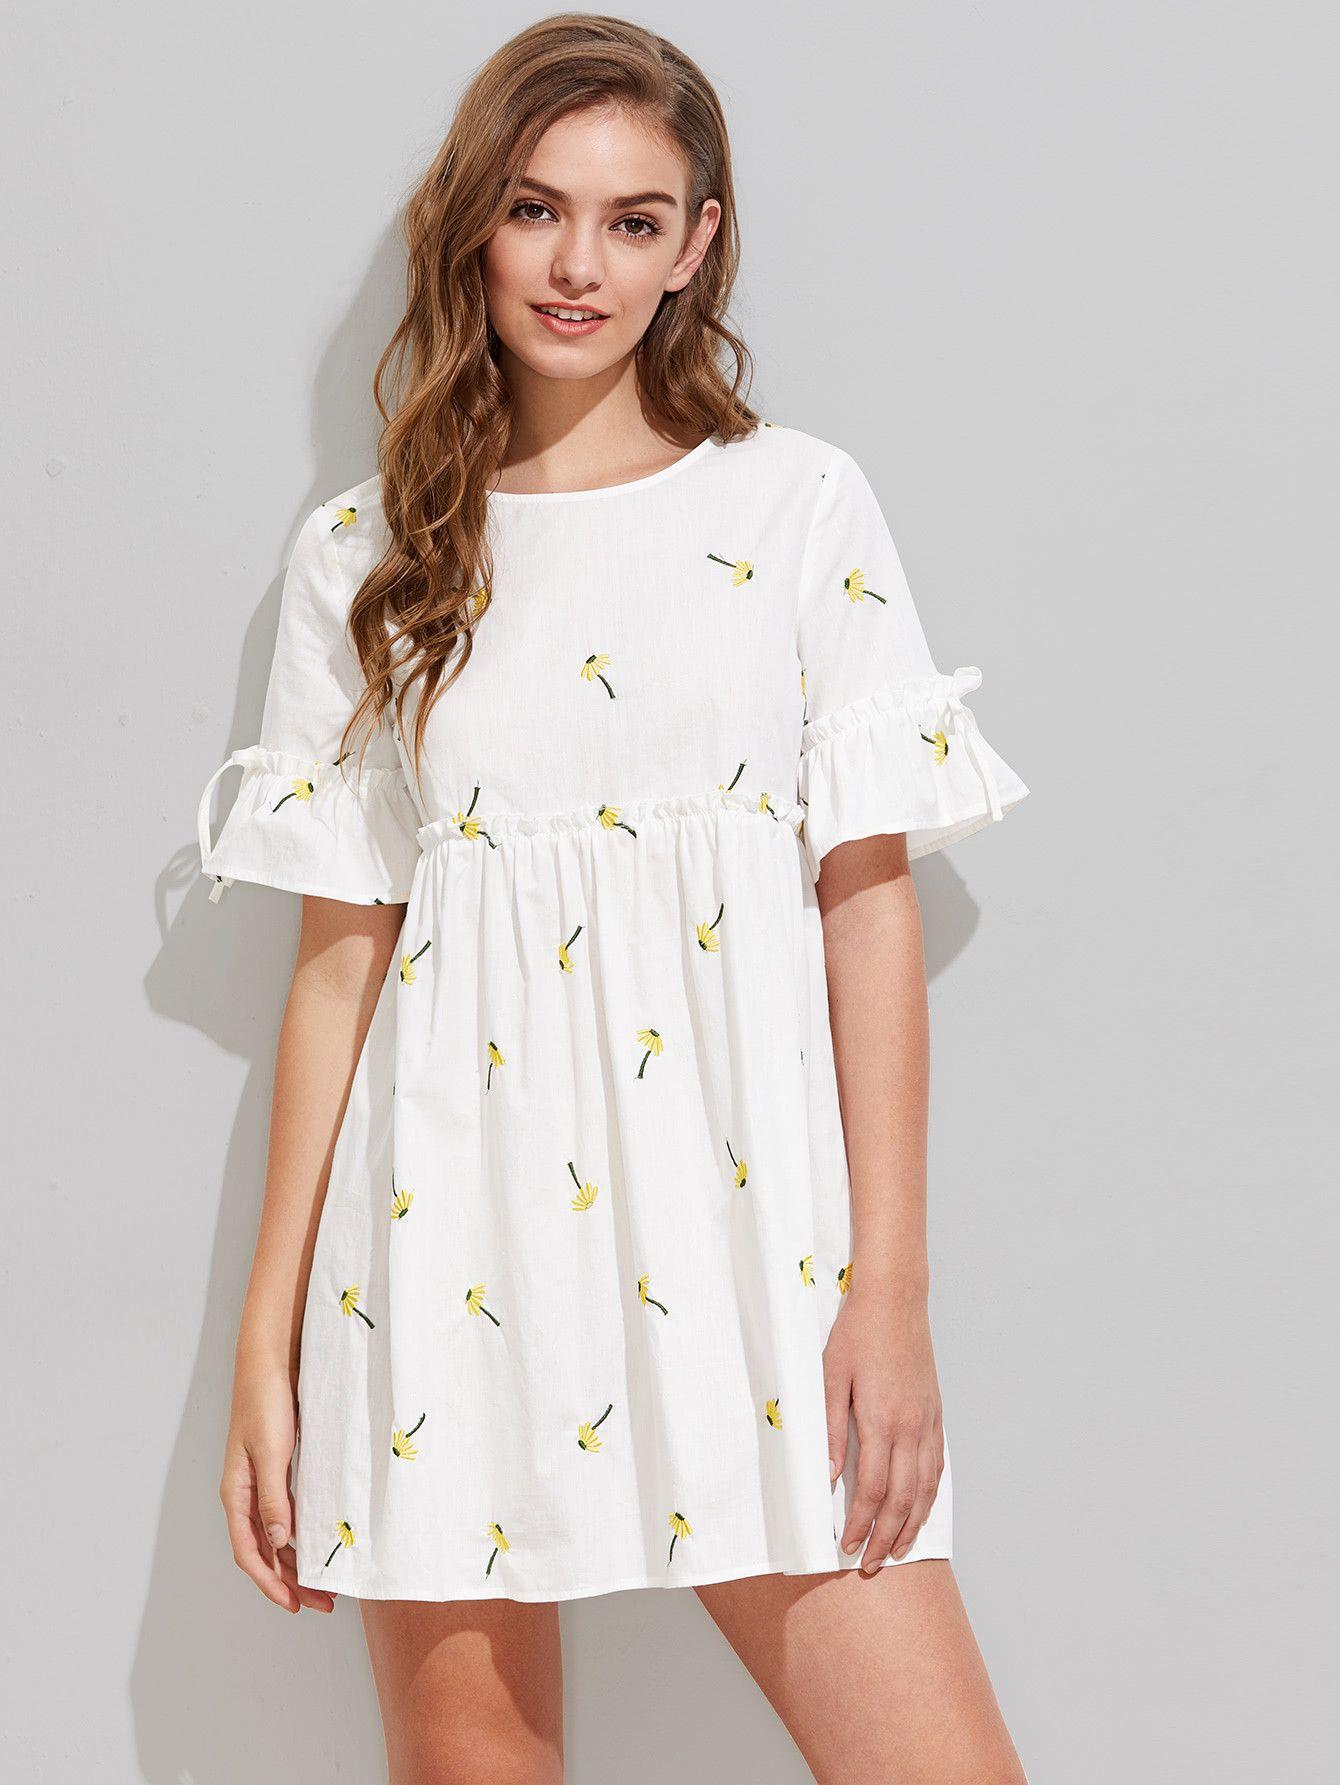 eb371f90b0c Shop Dandelion Embroidered Frilled Fluted Sleeve Babydoll Dress ...